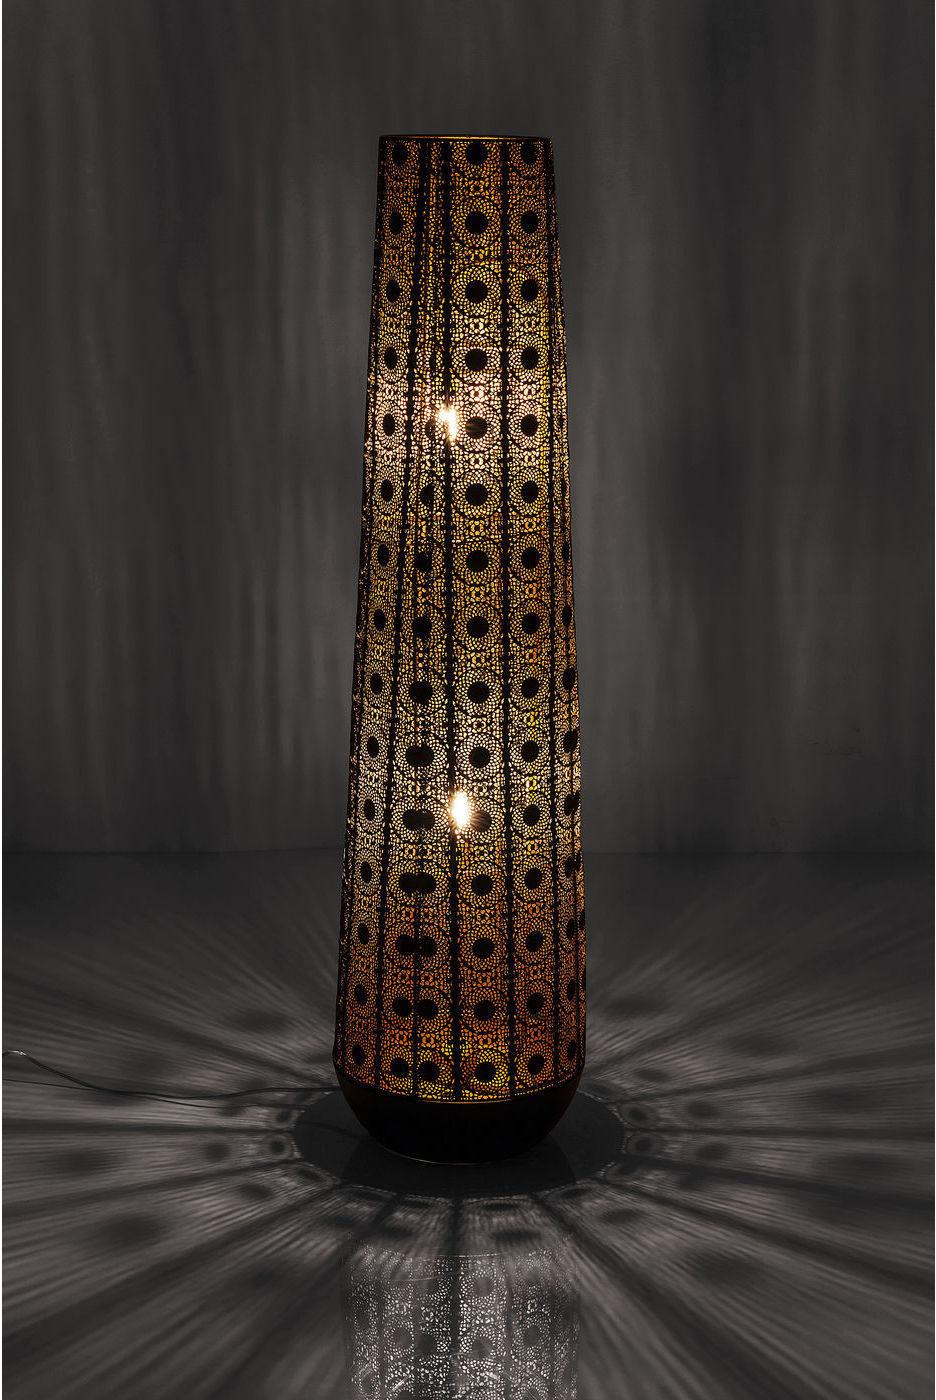 Kare Design - Vloerlamp Sultan Cone - H120 Cm - Zwart